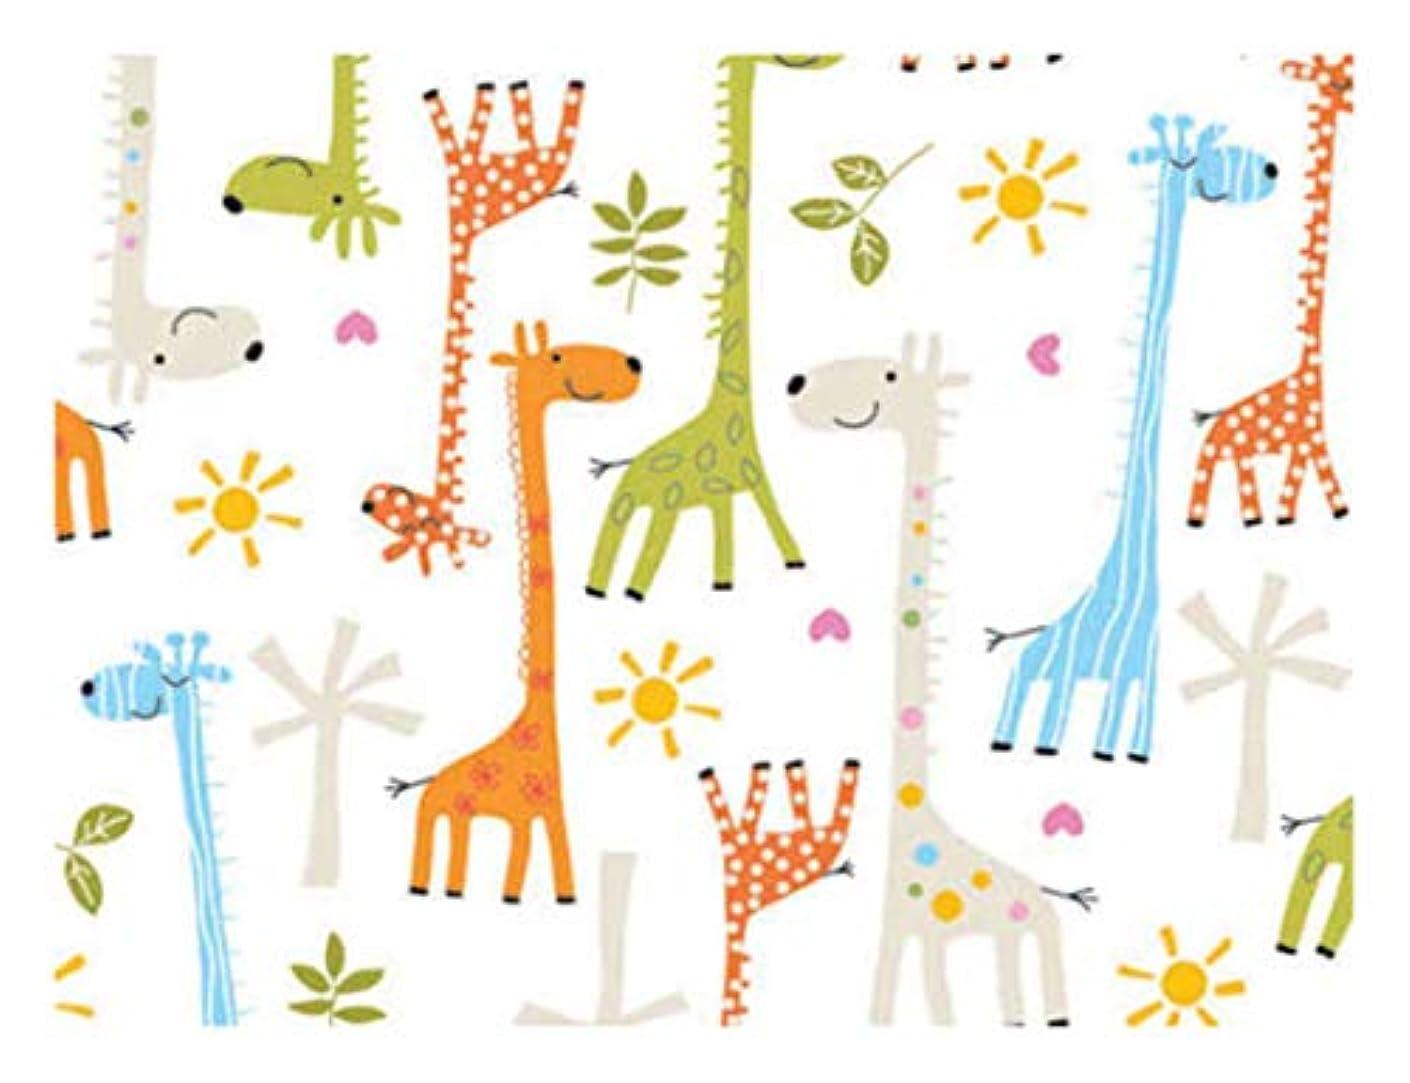 Whimsical Baby Giraffe Gift Wrap Paper Boy or Girl - 15 Foot Roll